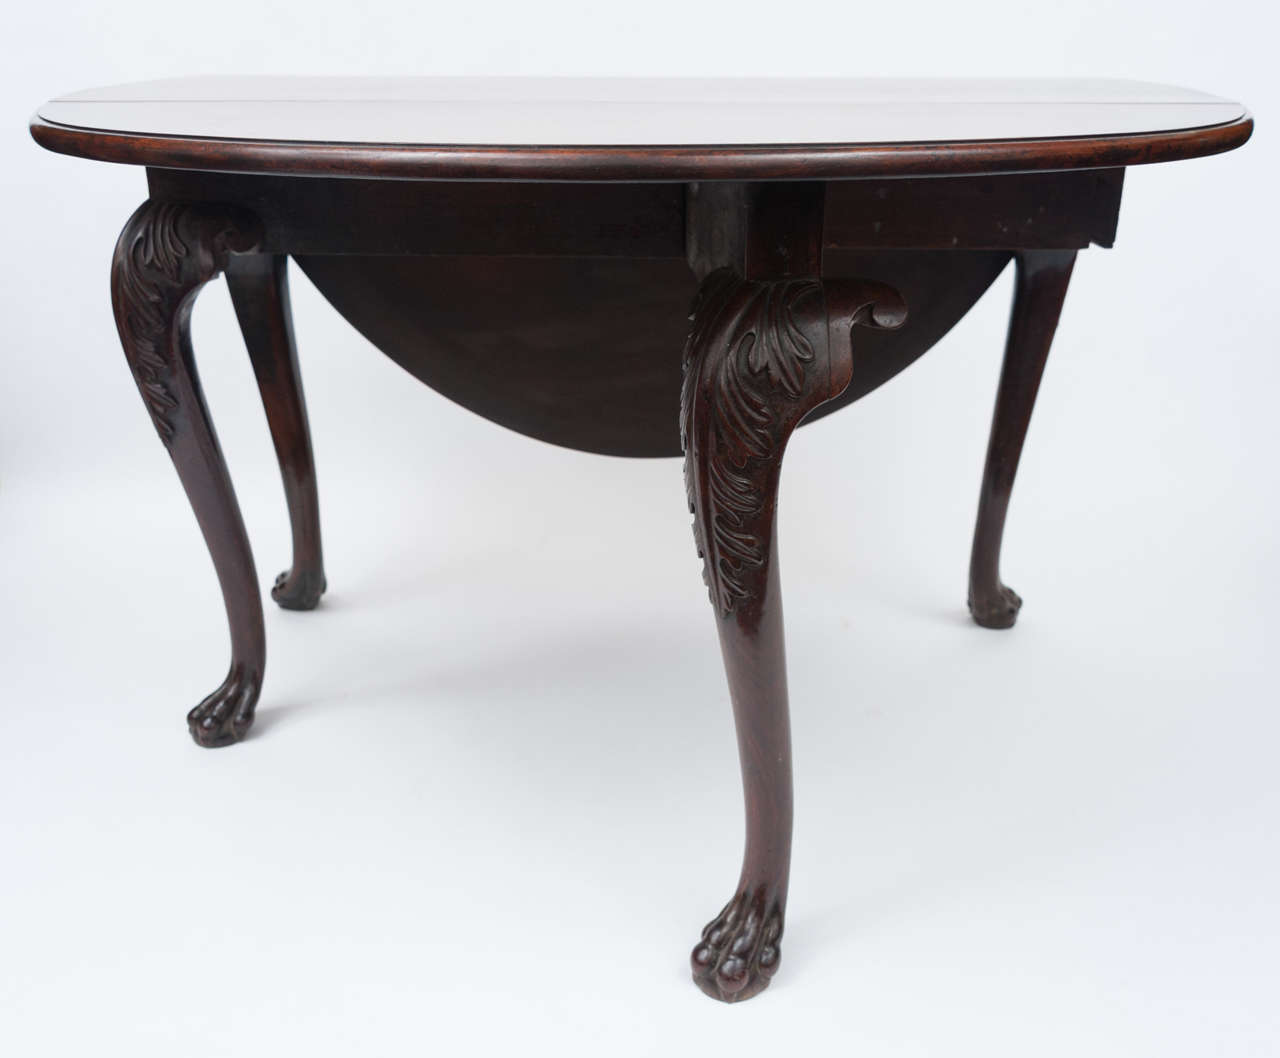 George II Irish Mahogany Drop Leaf Table For Sale At 1stdibs